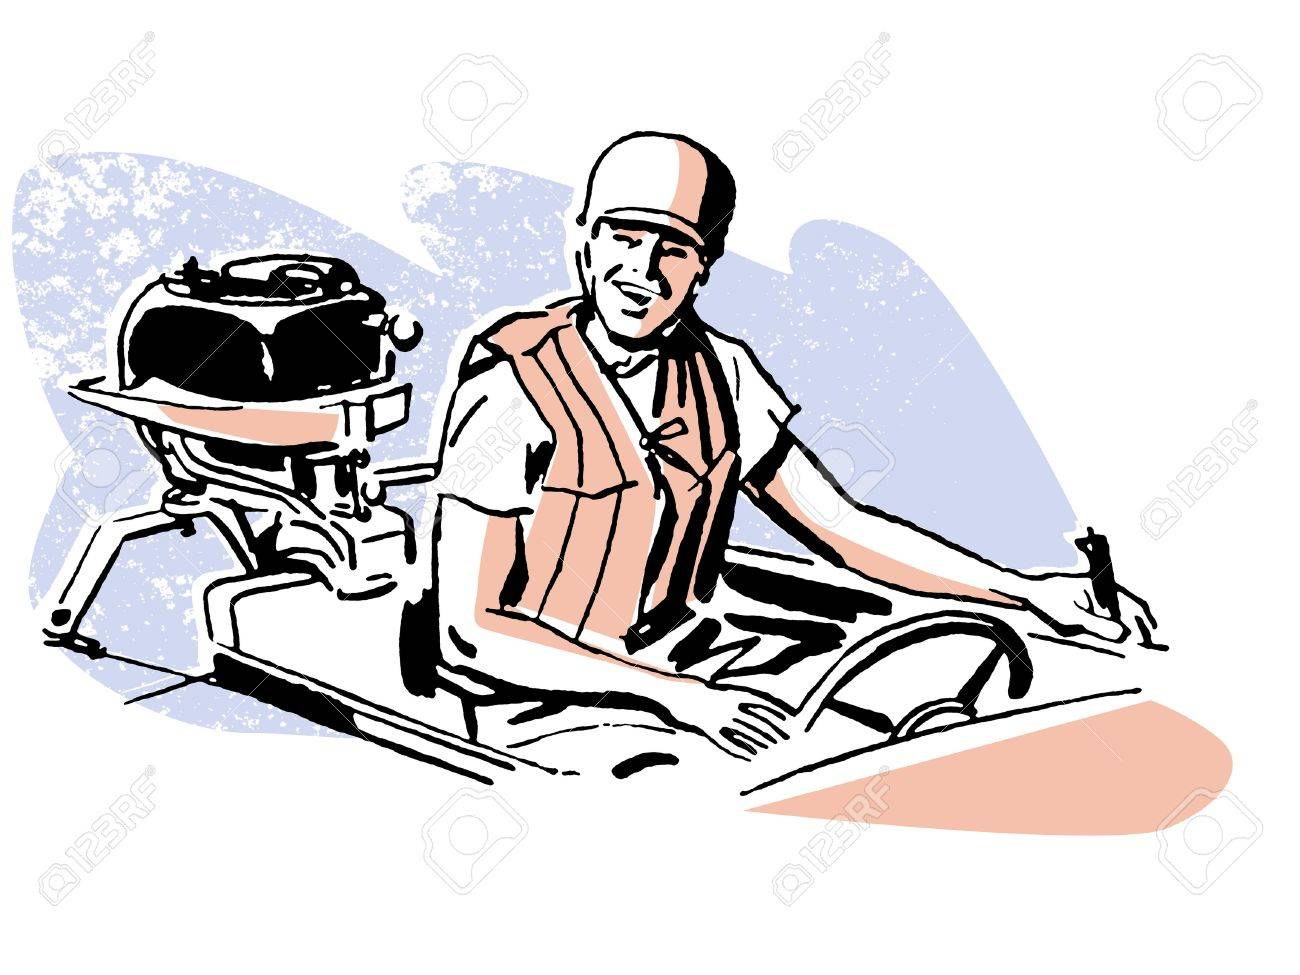 A vintage illustration of a man driving a boat Stock Illustration - 14918231